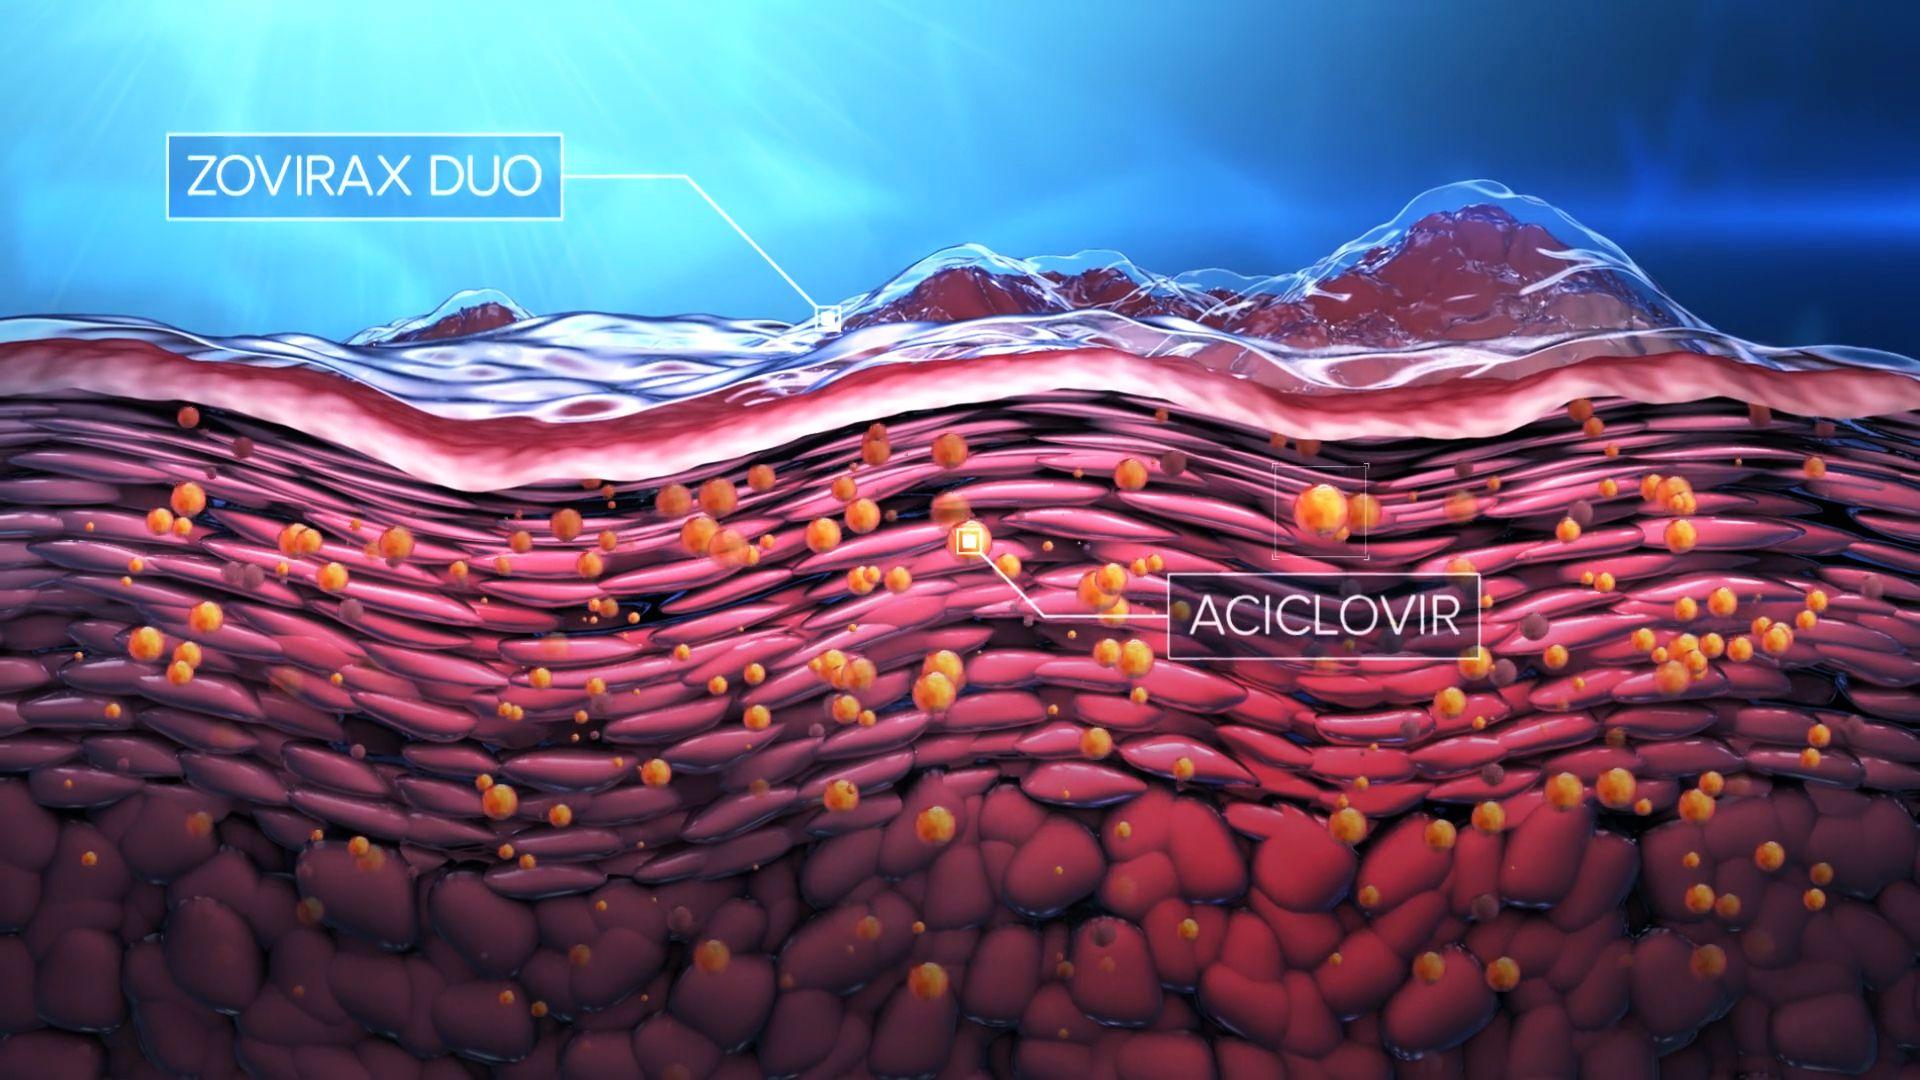 3D animation of aciclovir entering skin cells